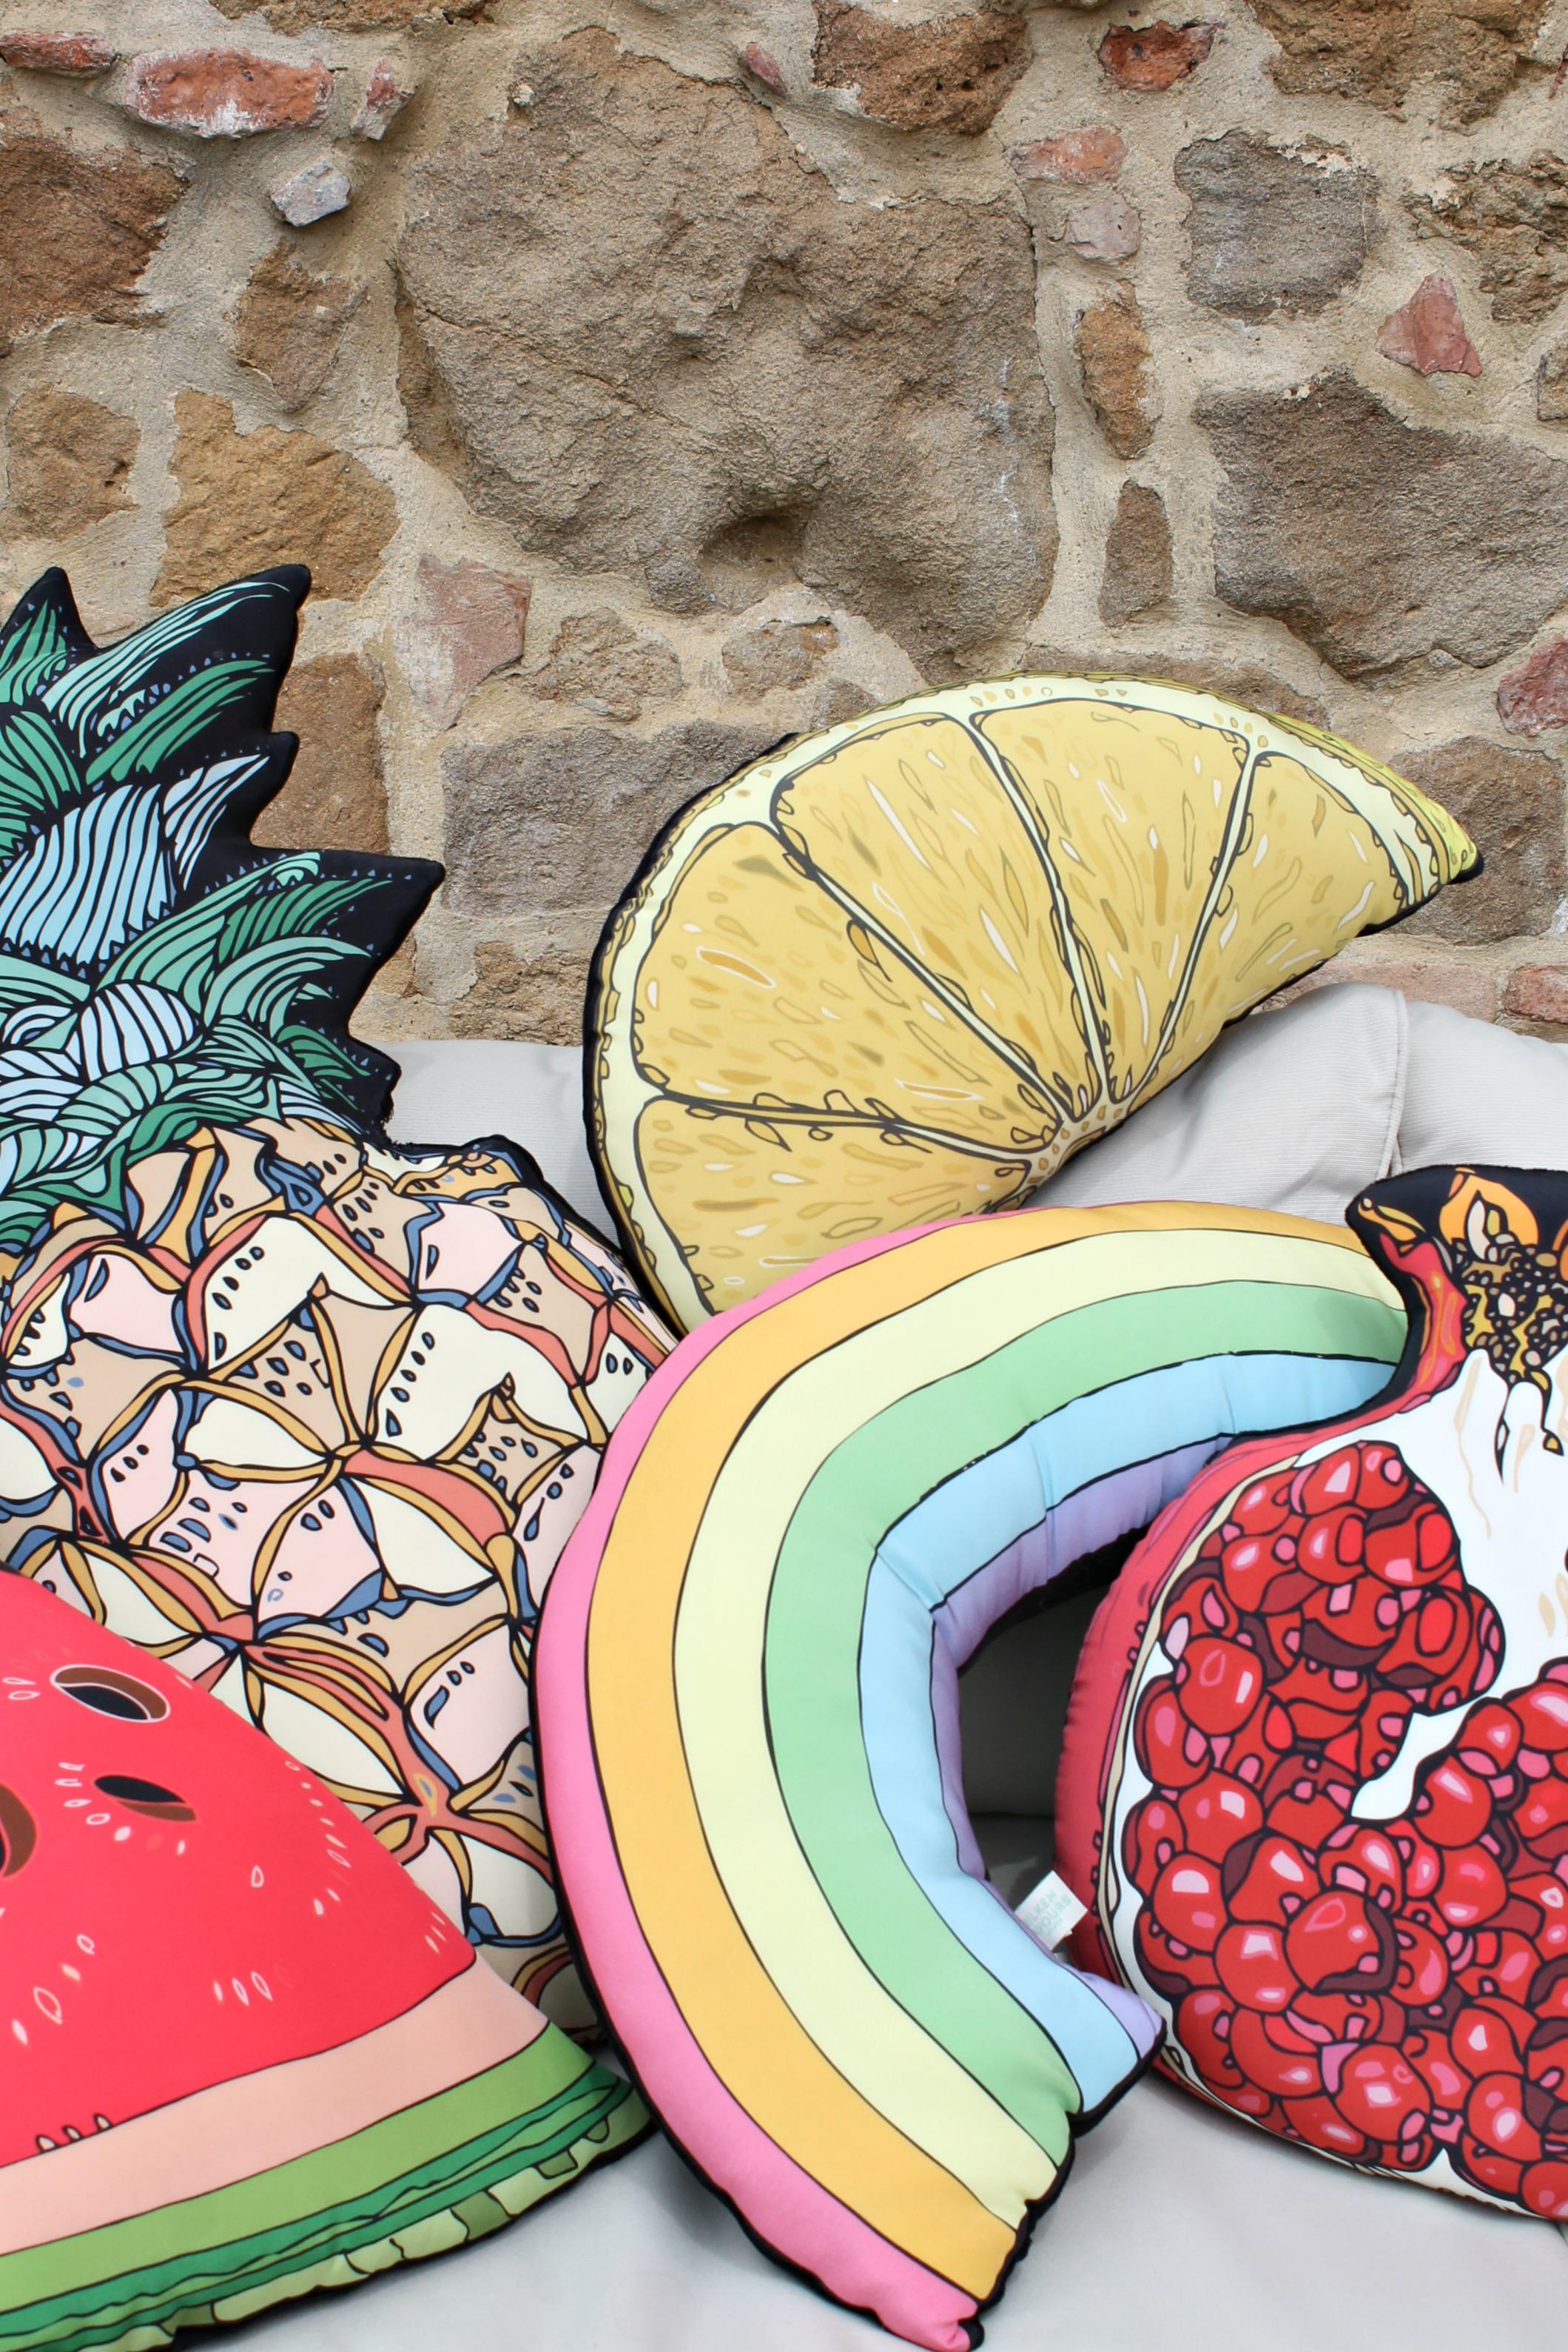 silken-favours-cushions-photo-by-Little-Big-Bell